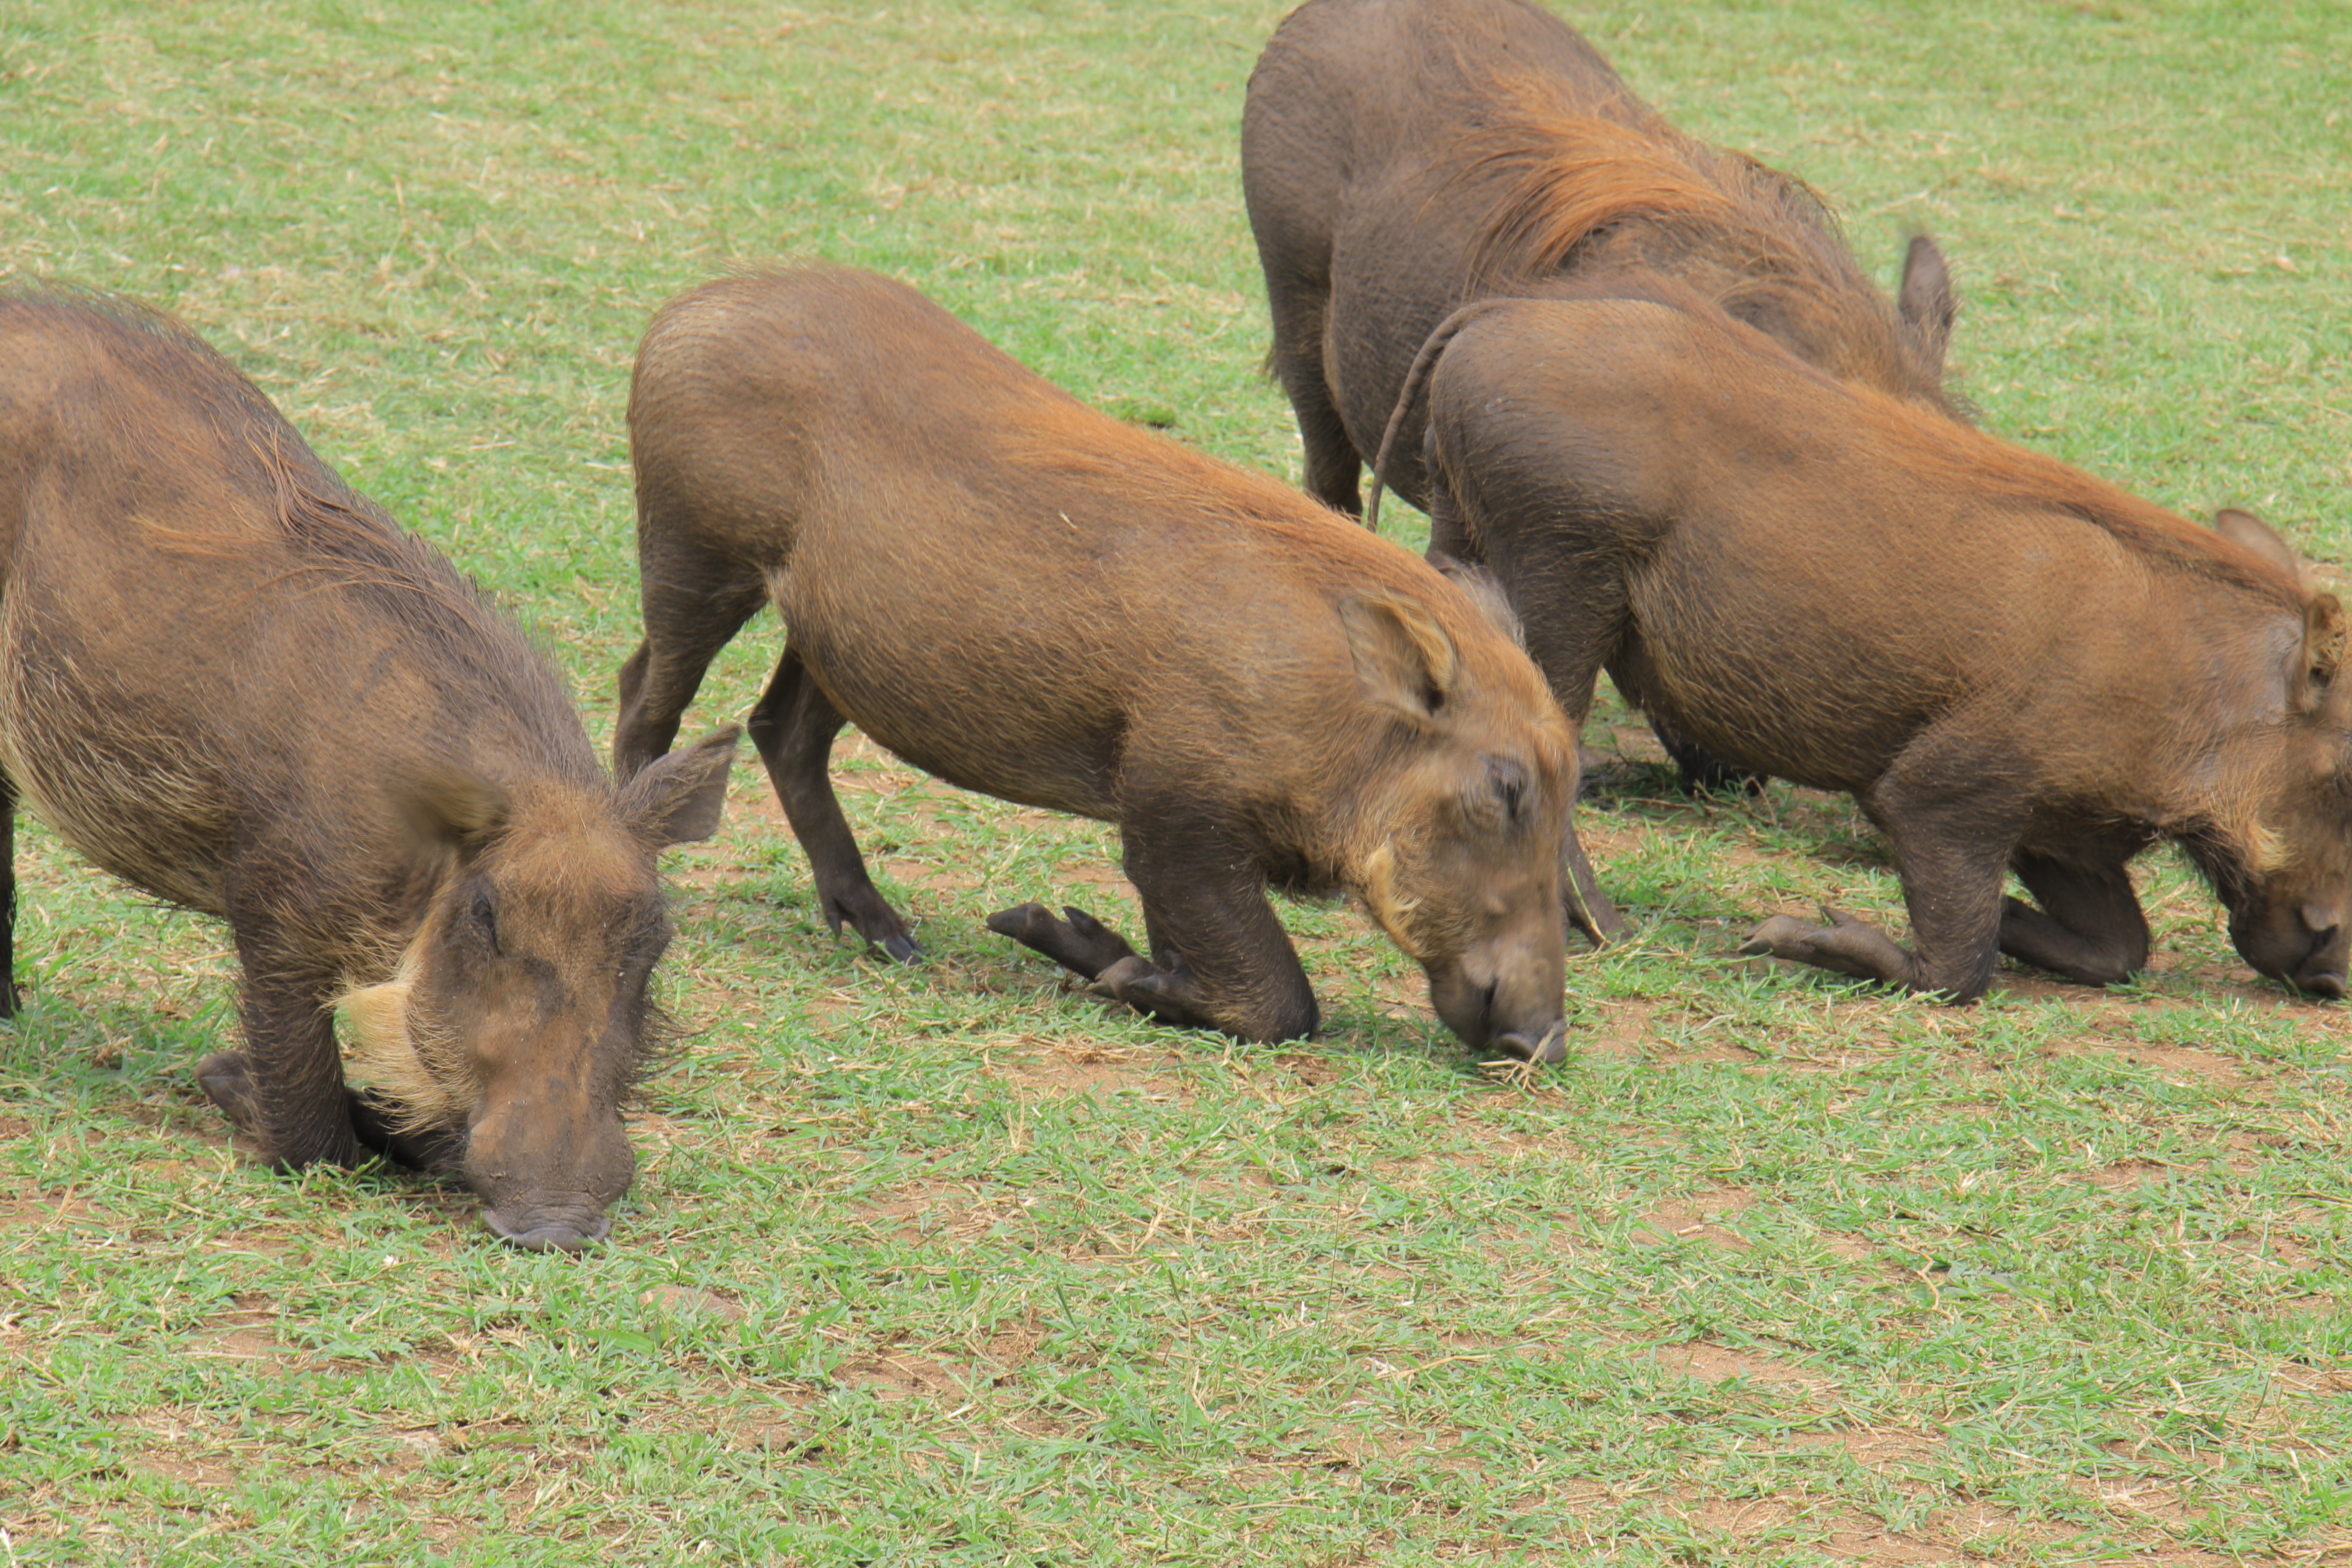 10 Days Road Trip to Encounter Gorillas & Wildlife in Uganda Tour 2